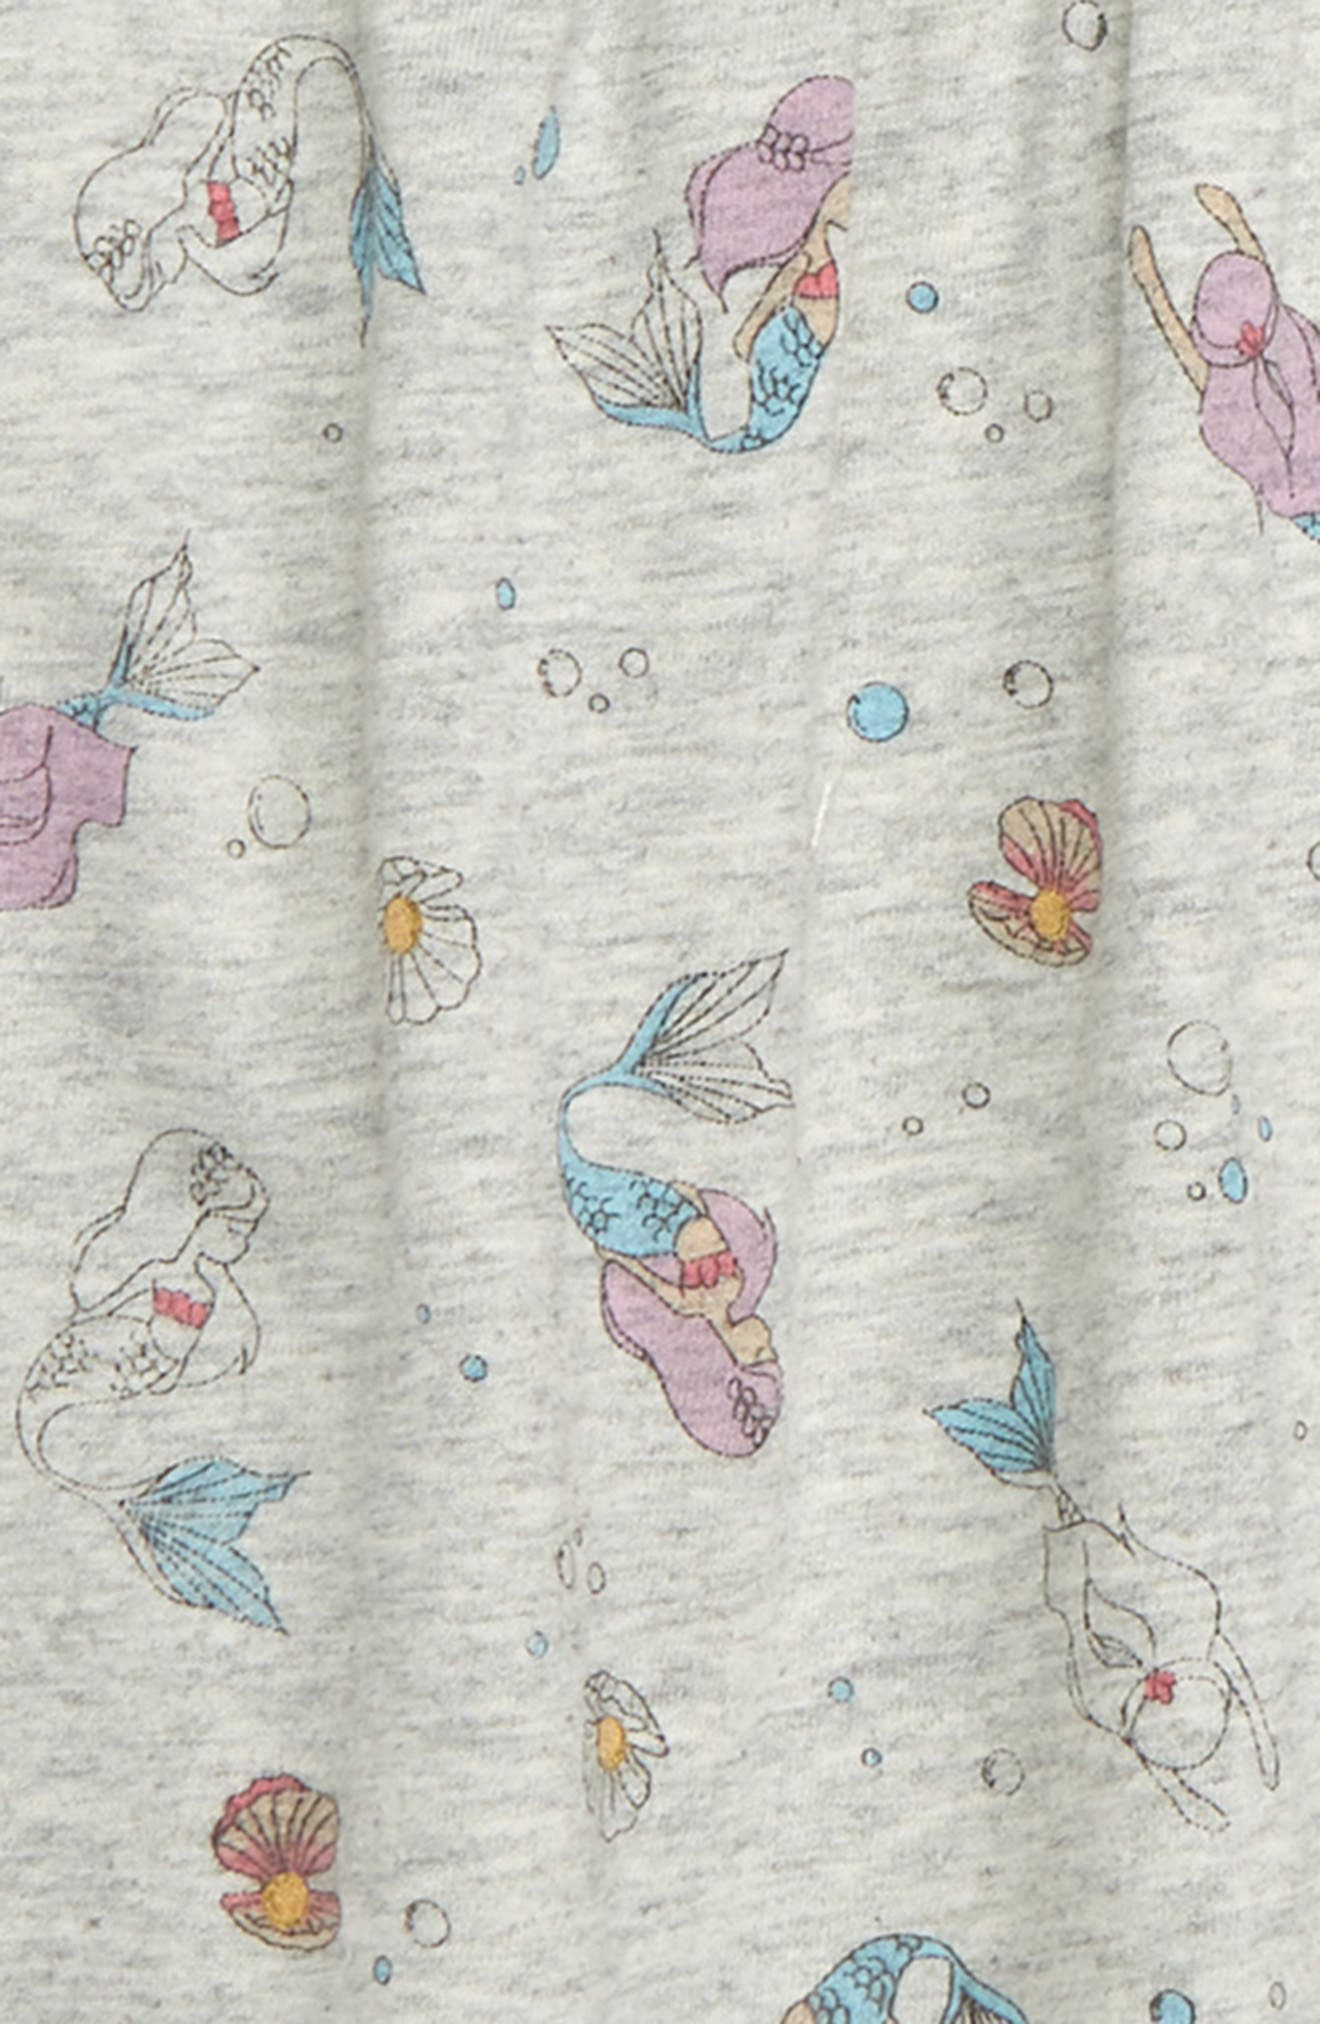 PEEK ESSENTIALS,                             Baby Mermaid Coveralls,                             Alternate thumbnail 2, color,                             HEATHER GREY